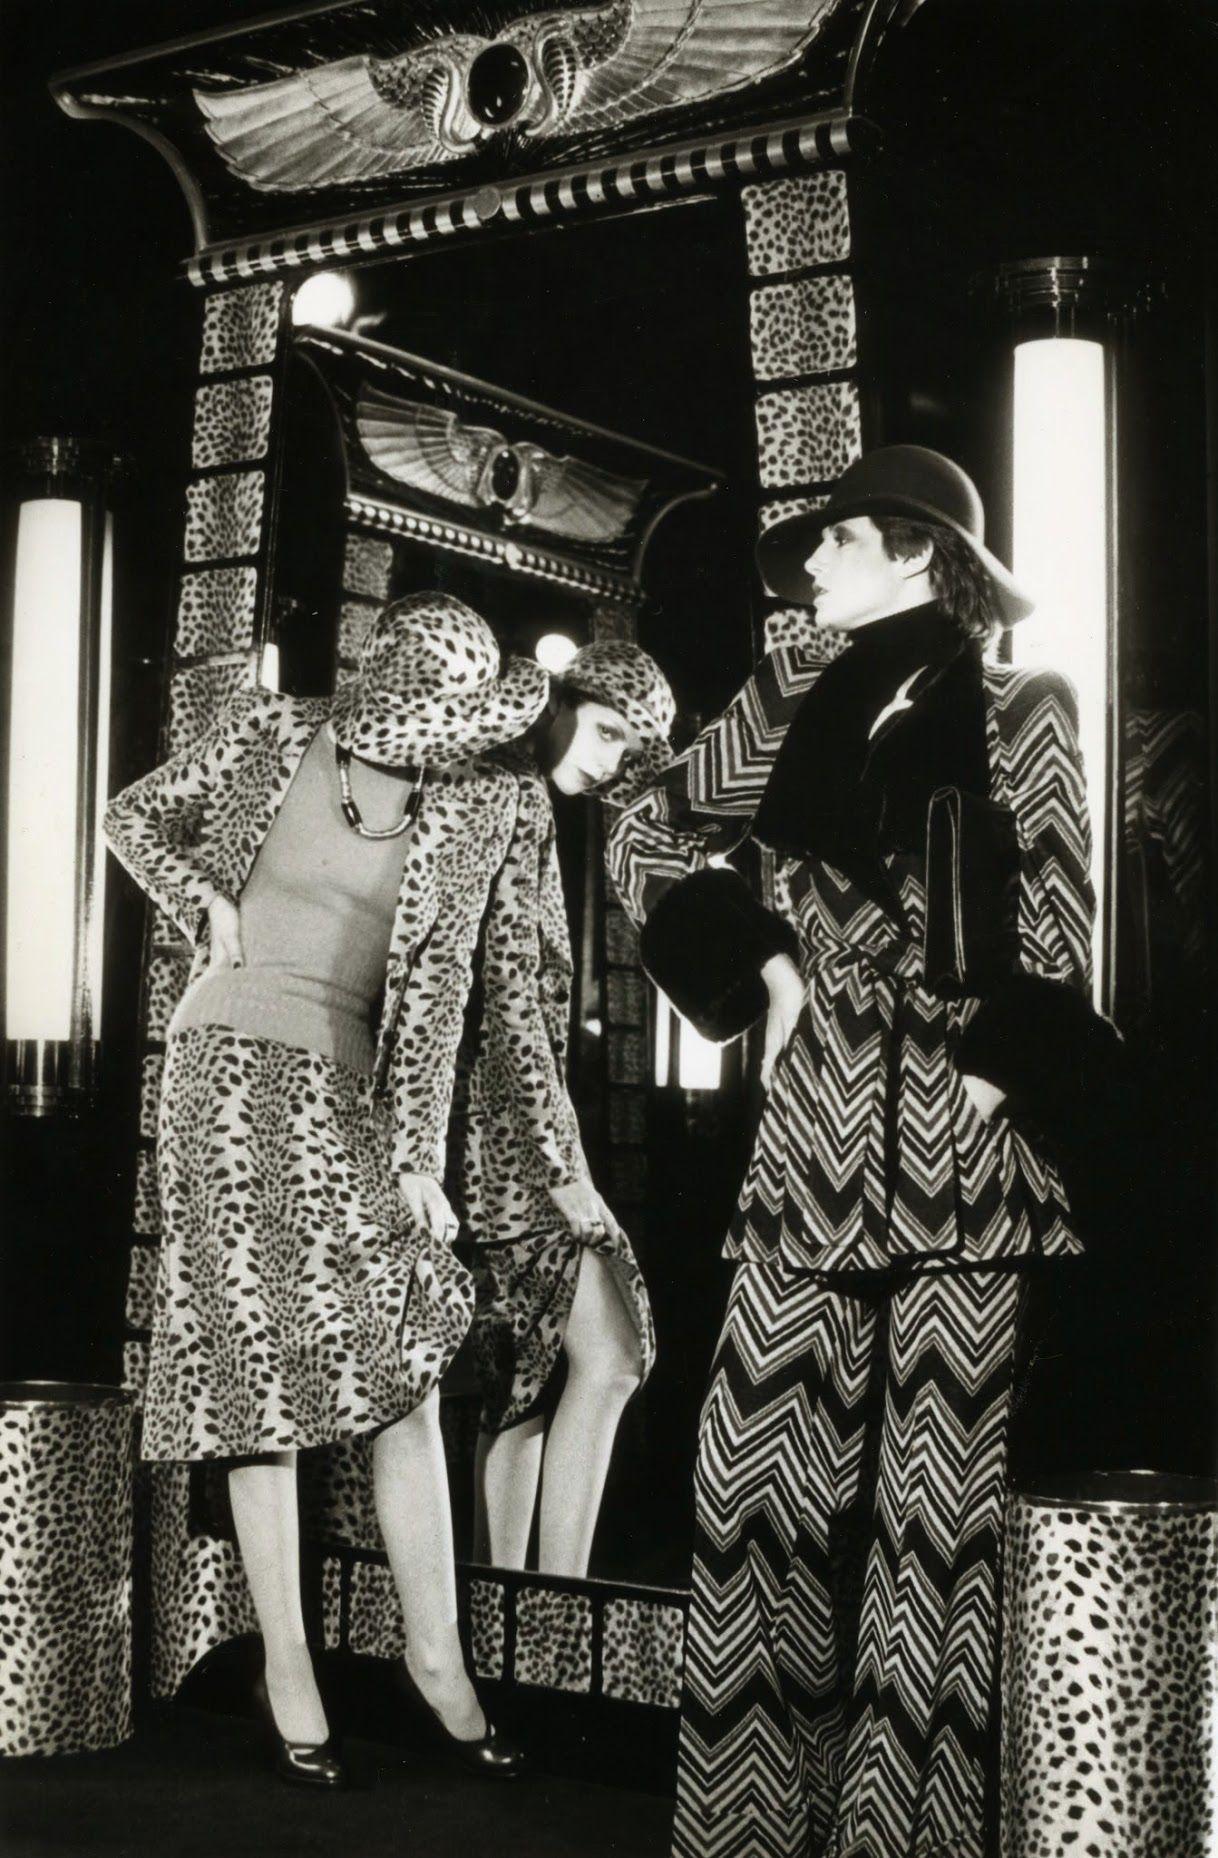 How does 1960's biba influence fashion today?